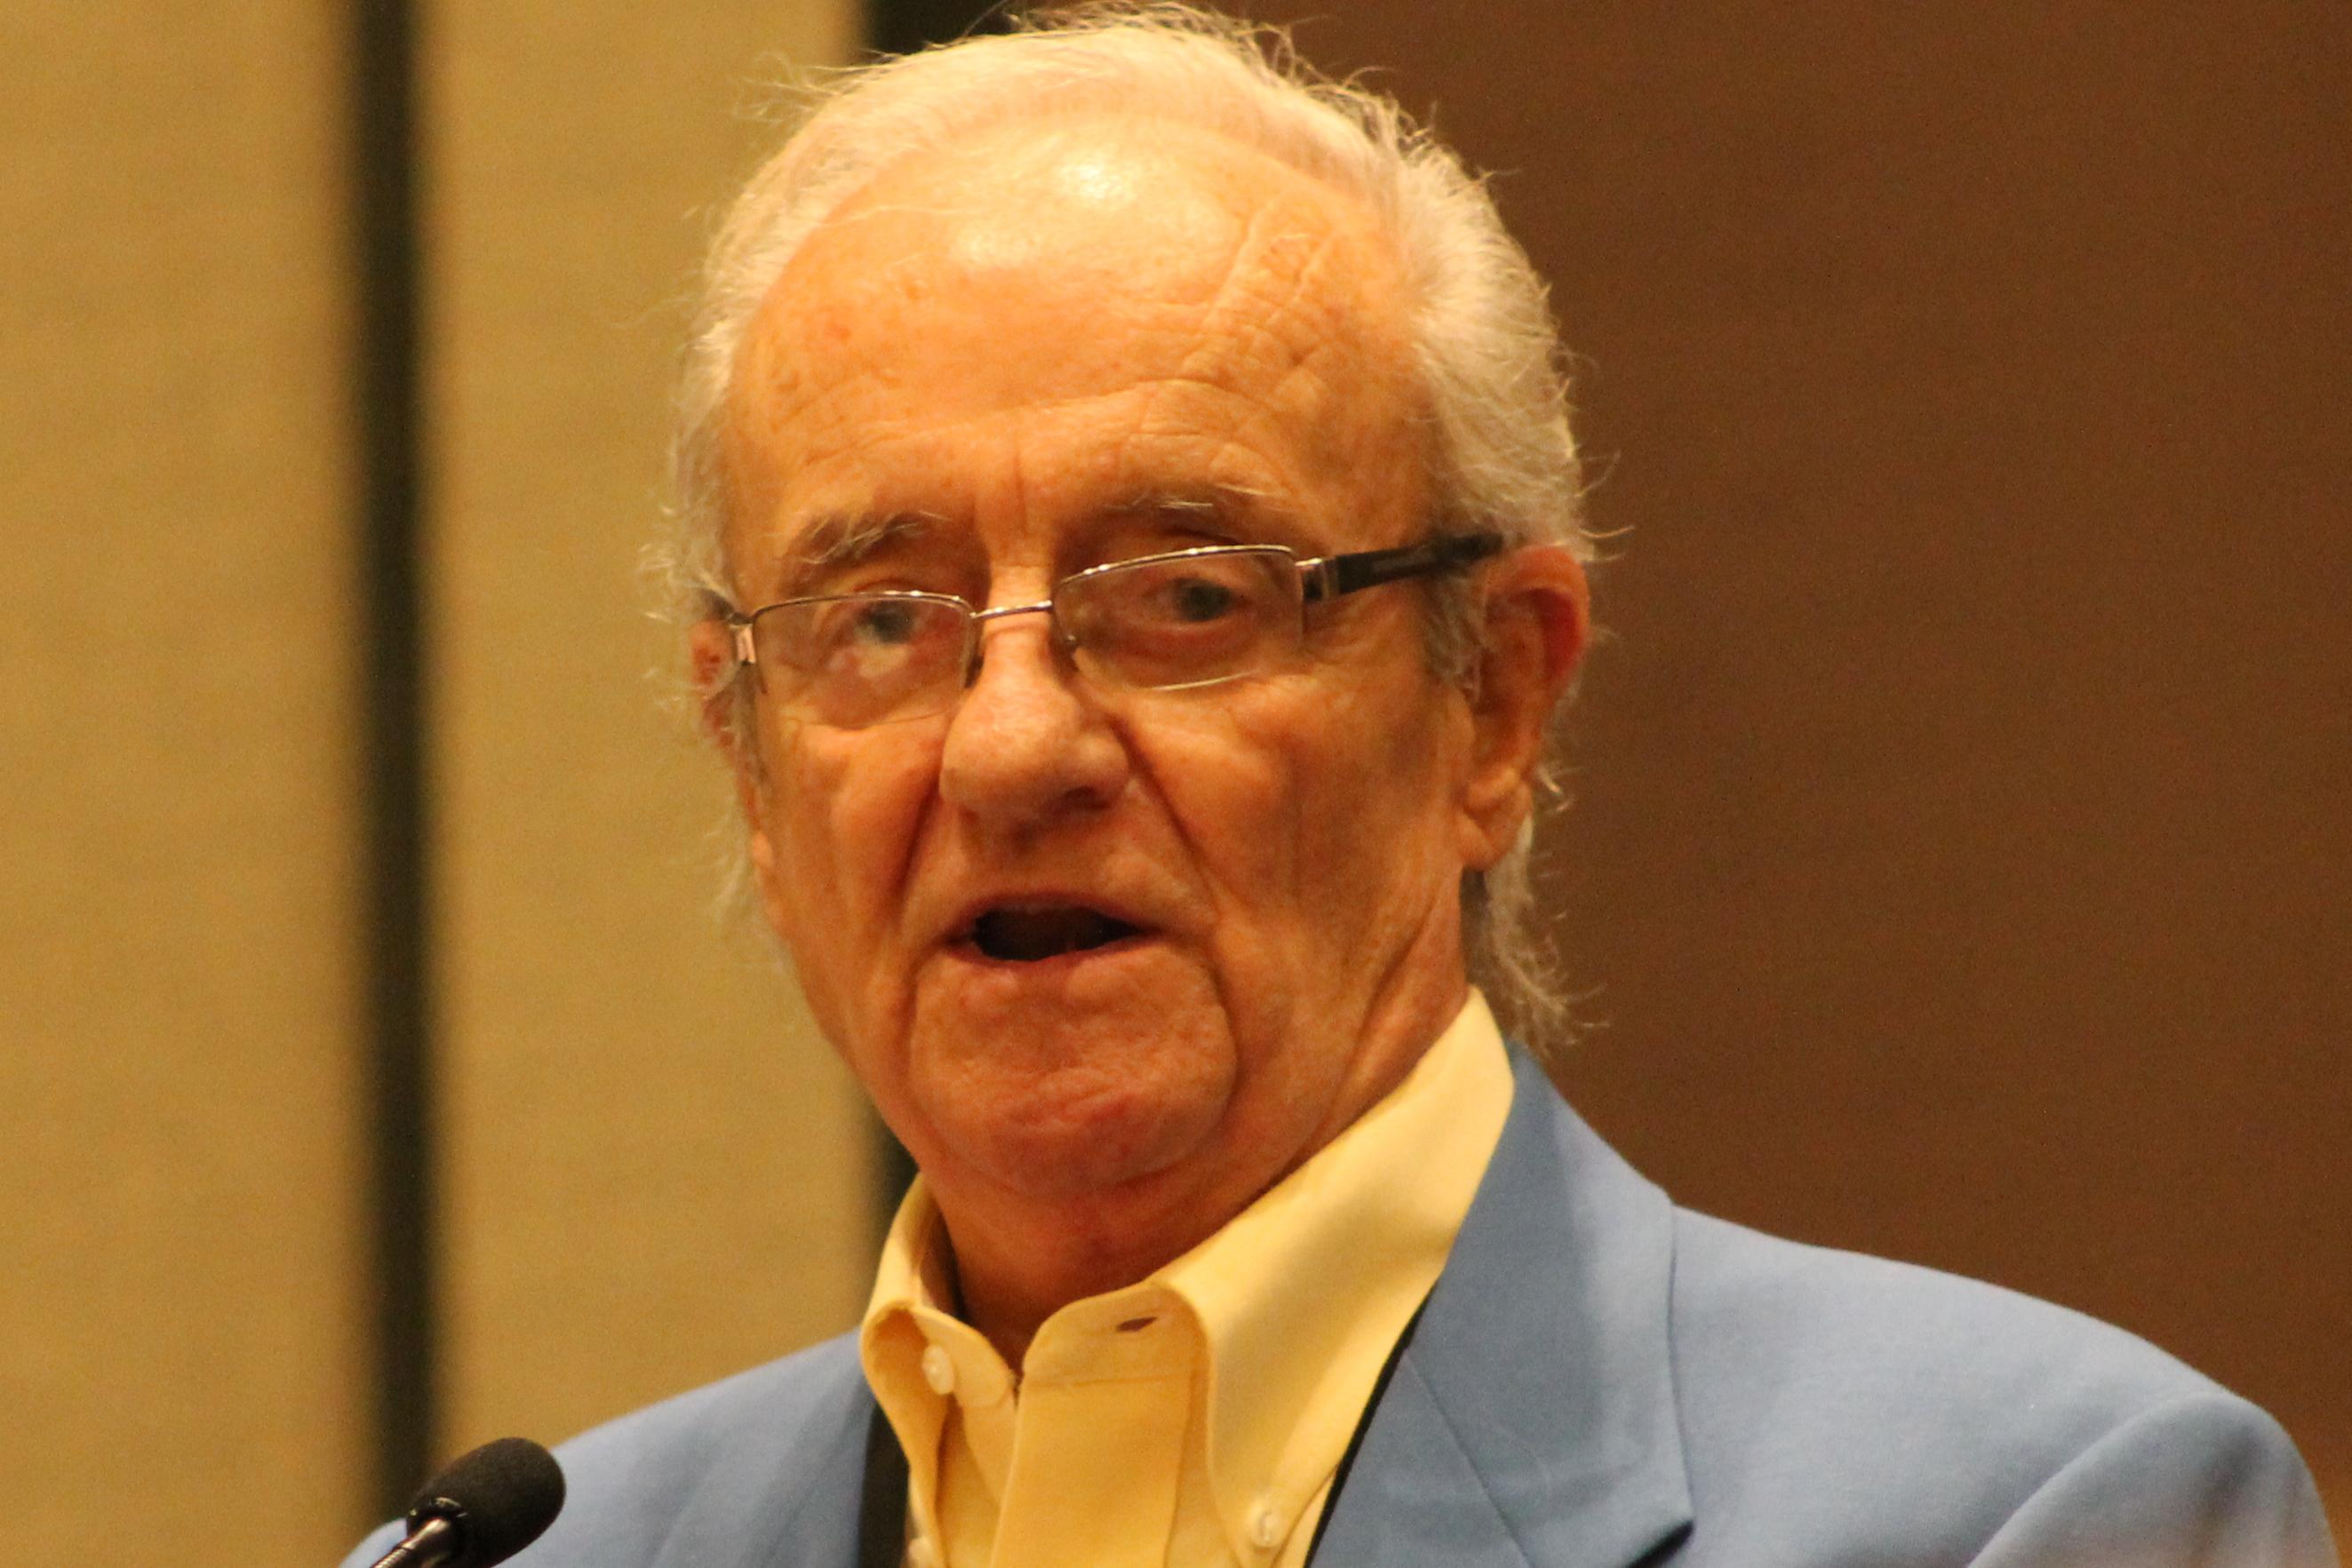 Roland_Hemond_at_SABR_Convention_2014